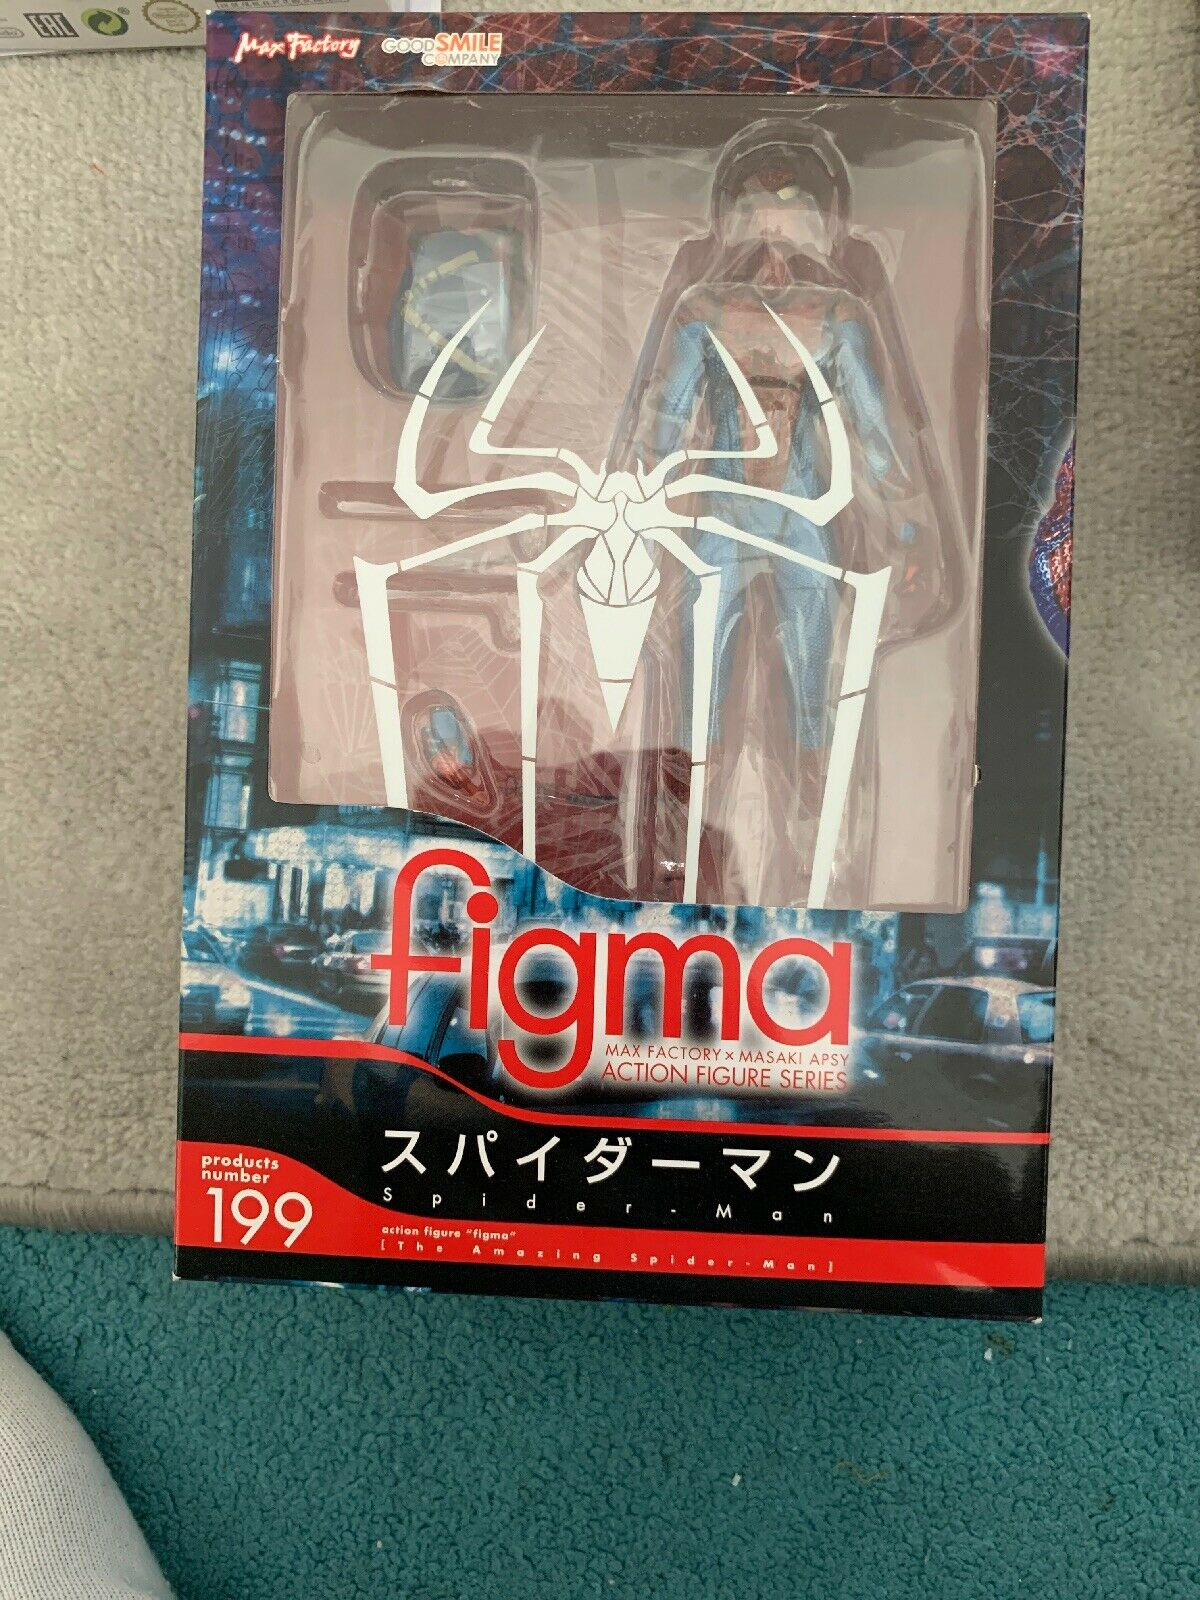 Max, la fábrica figma 199, Spider - Man original engañoso.